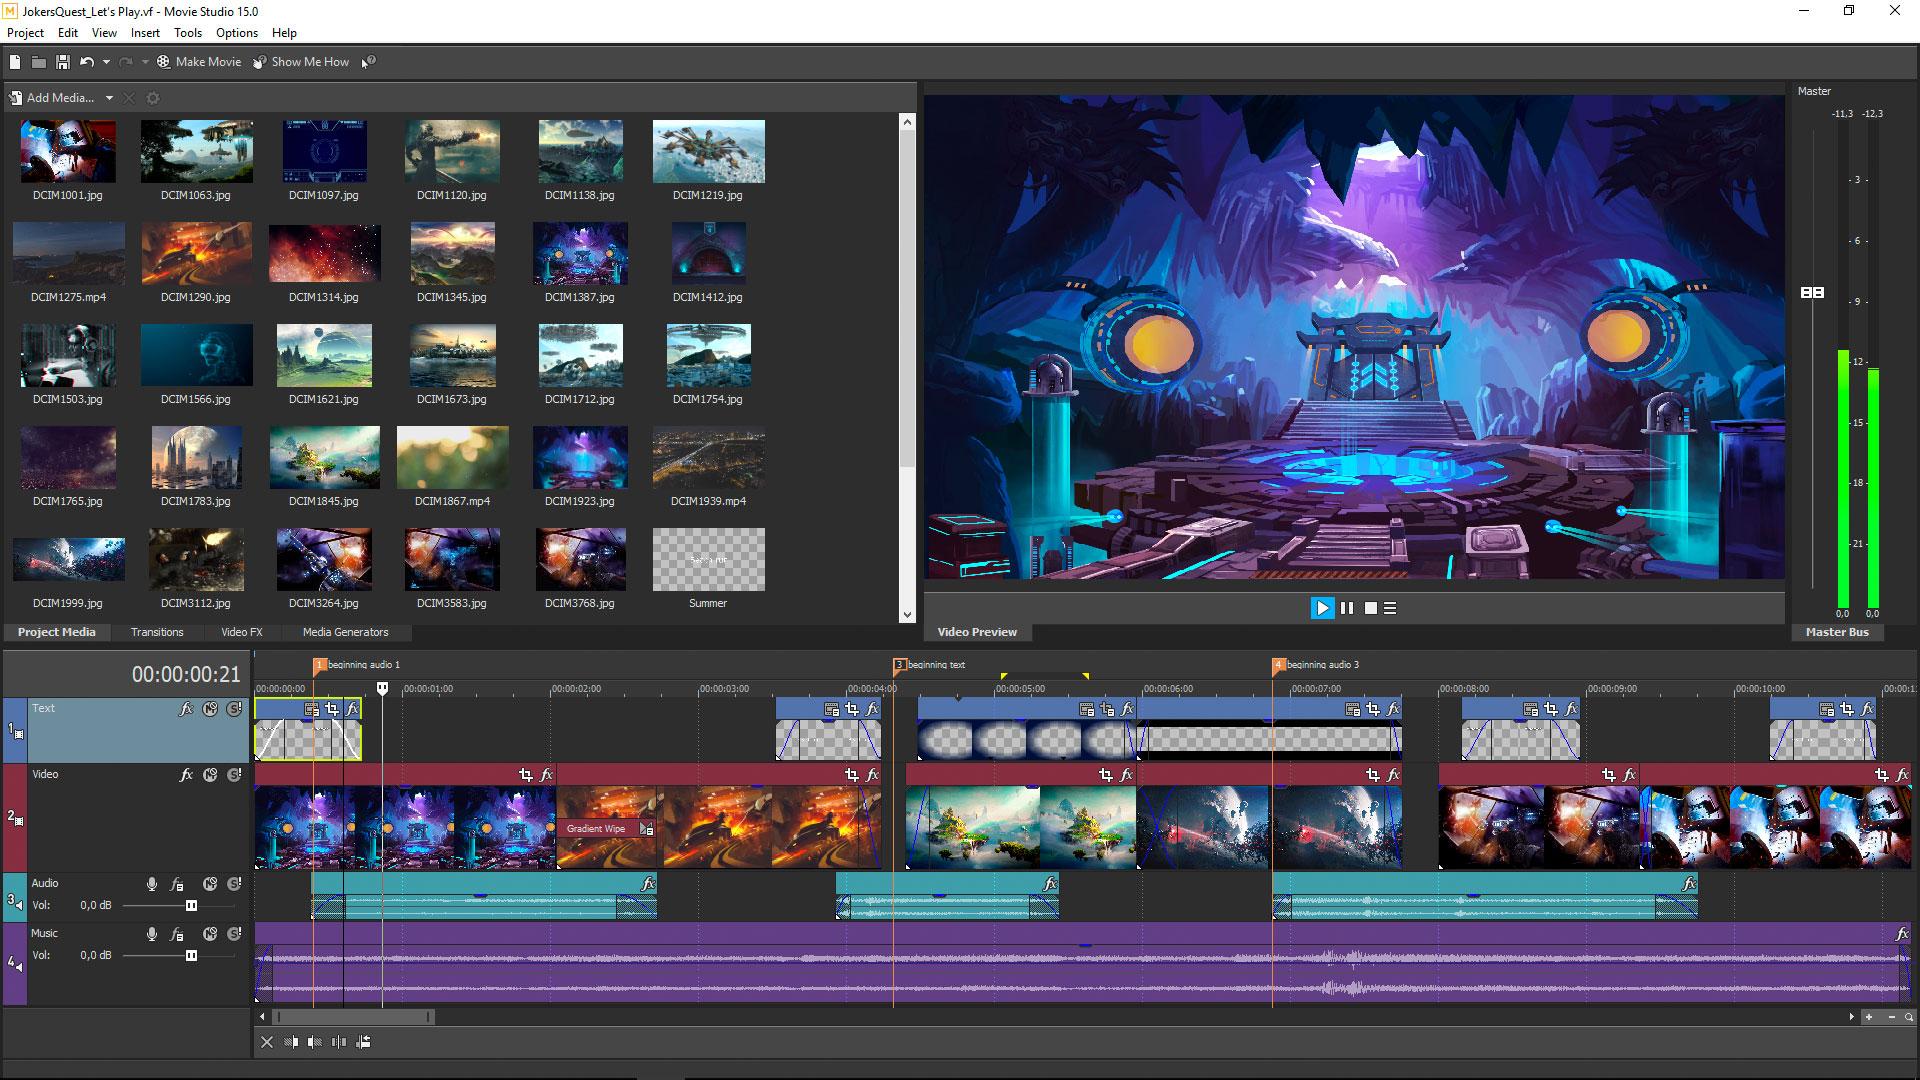 VEGAS Movie Studio 15 Steam Edition screenshot